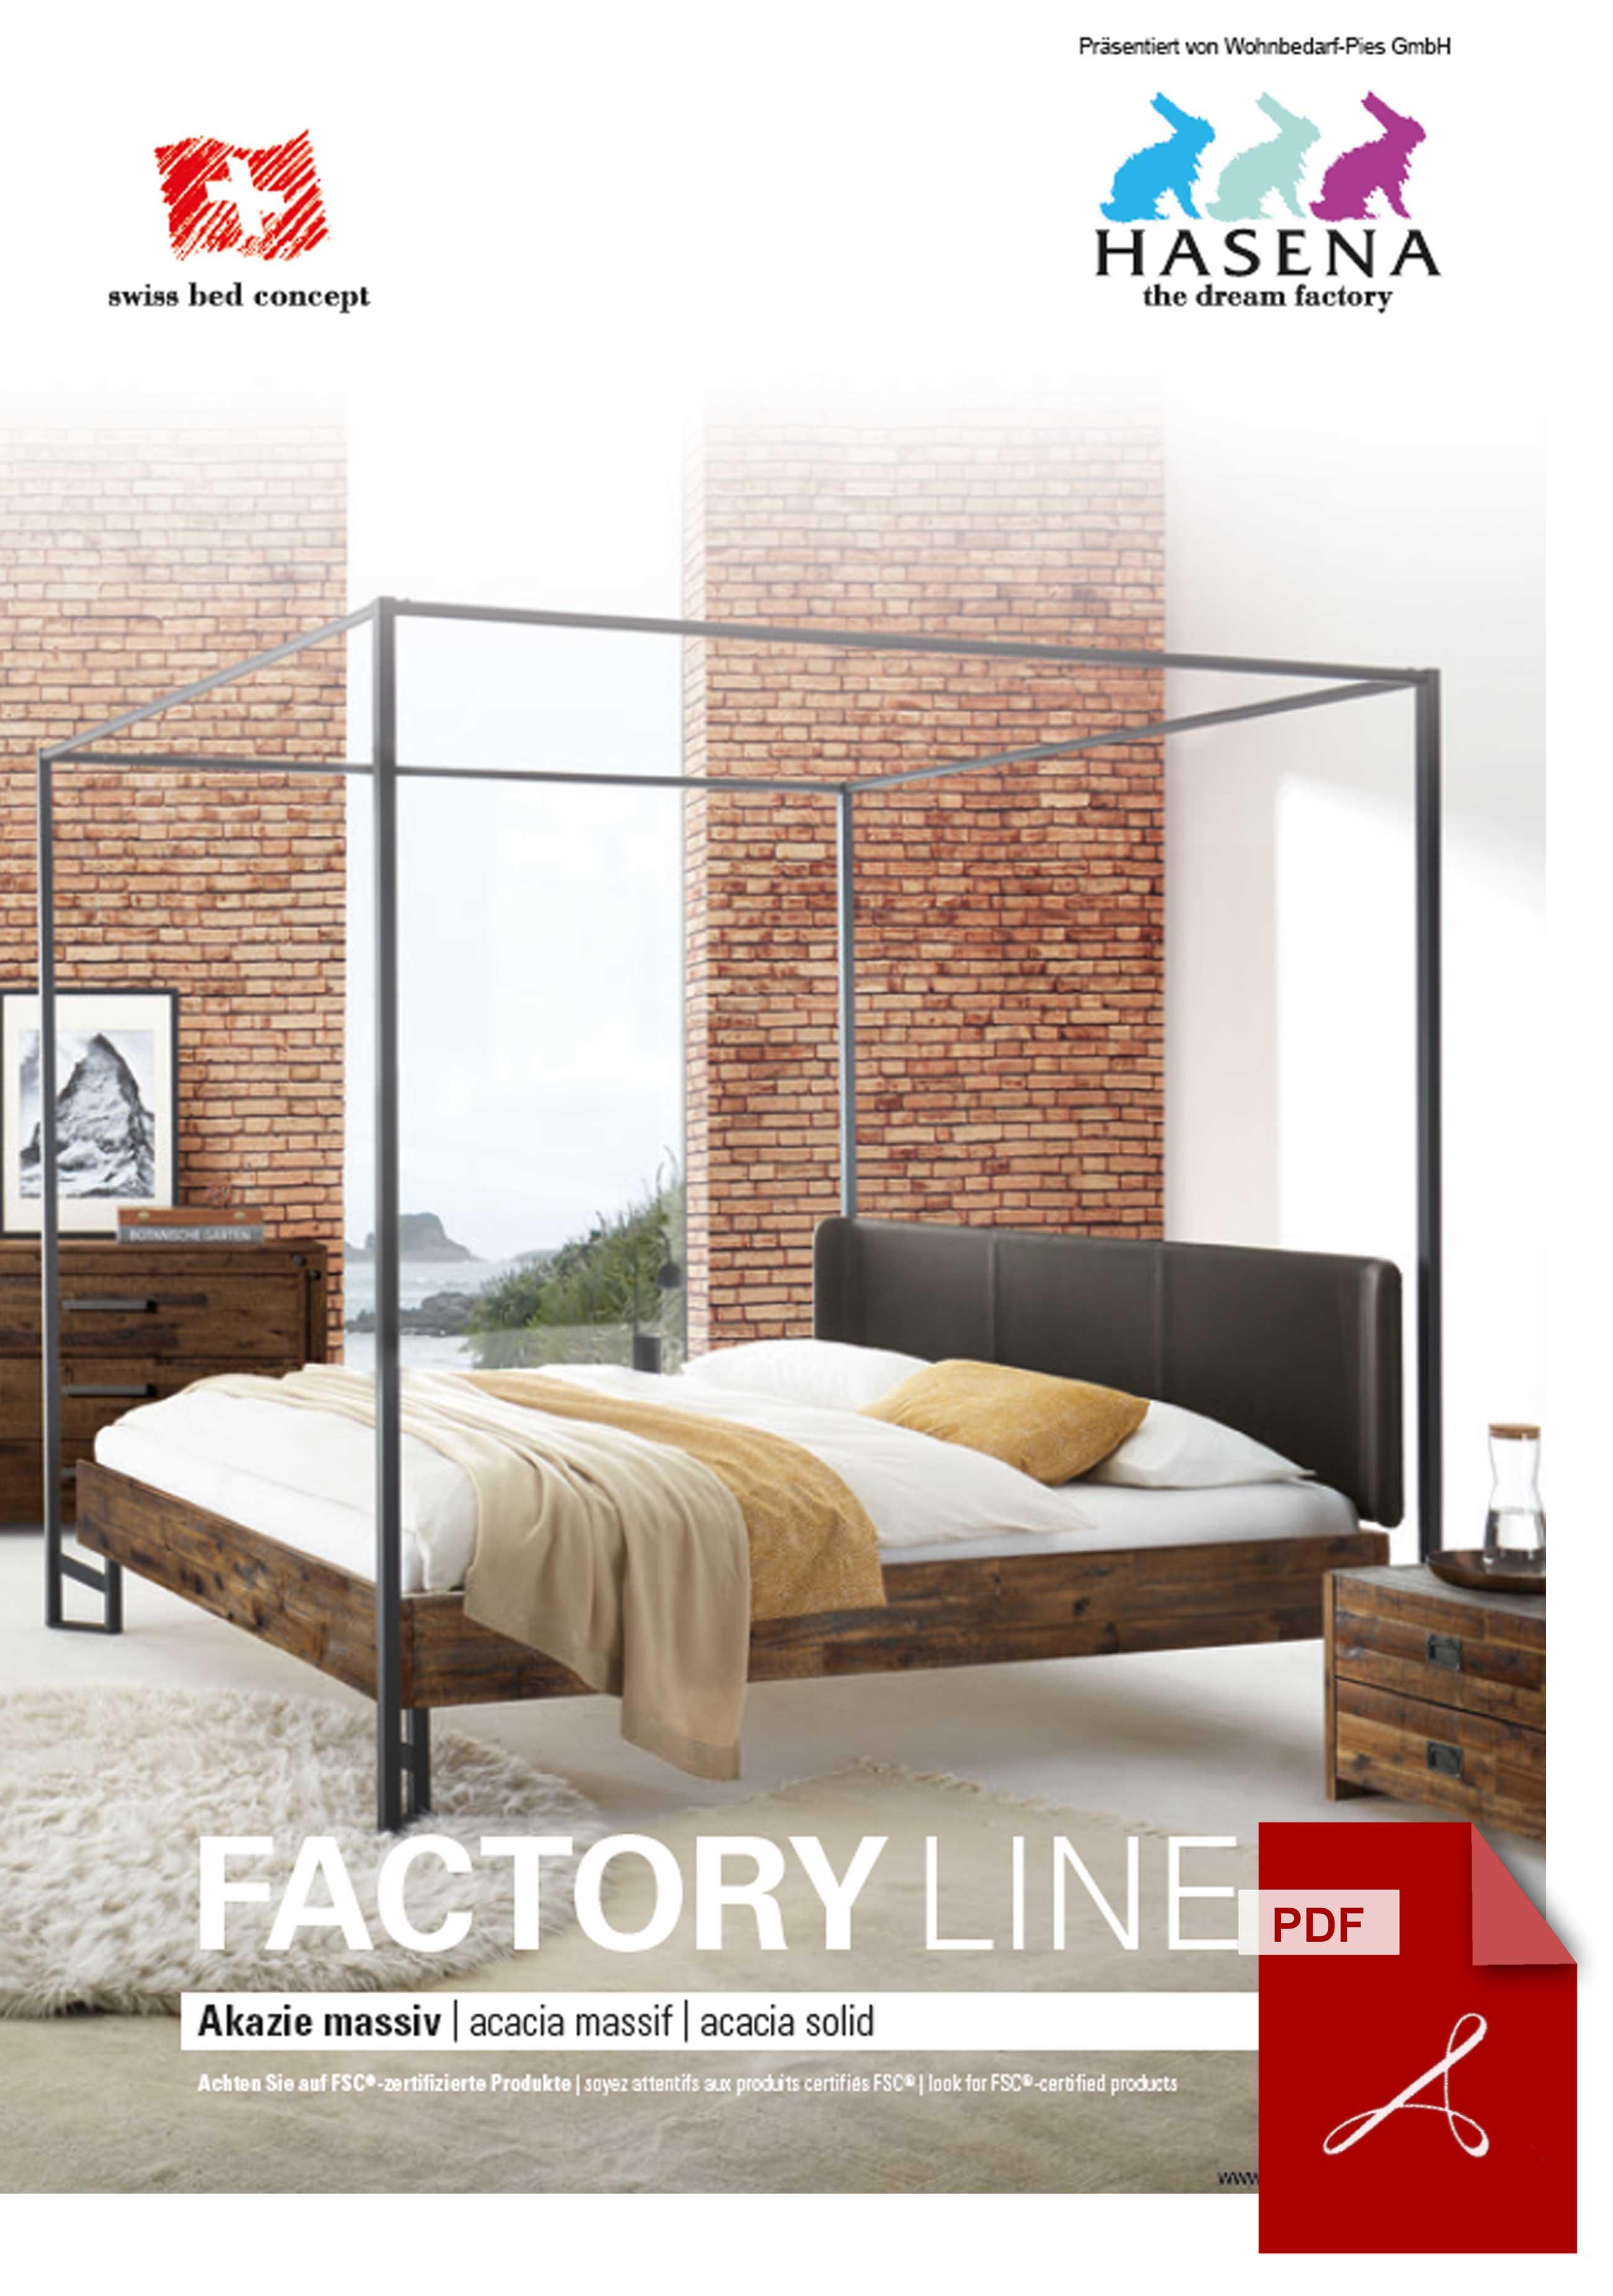 Hasena Factory Line Katalog als PDF Datei